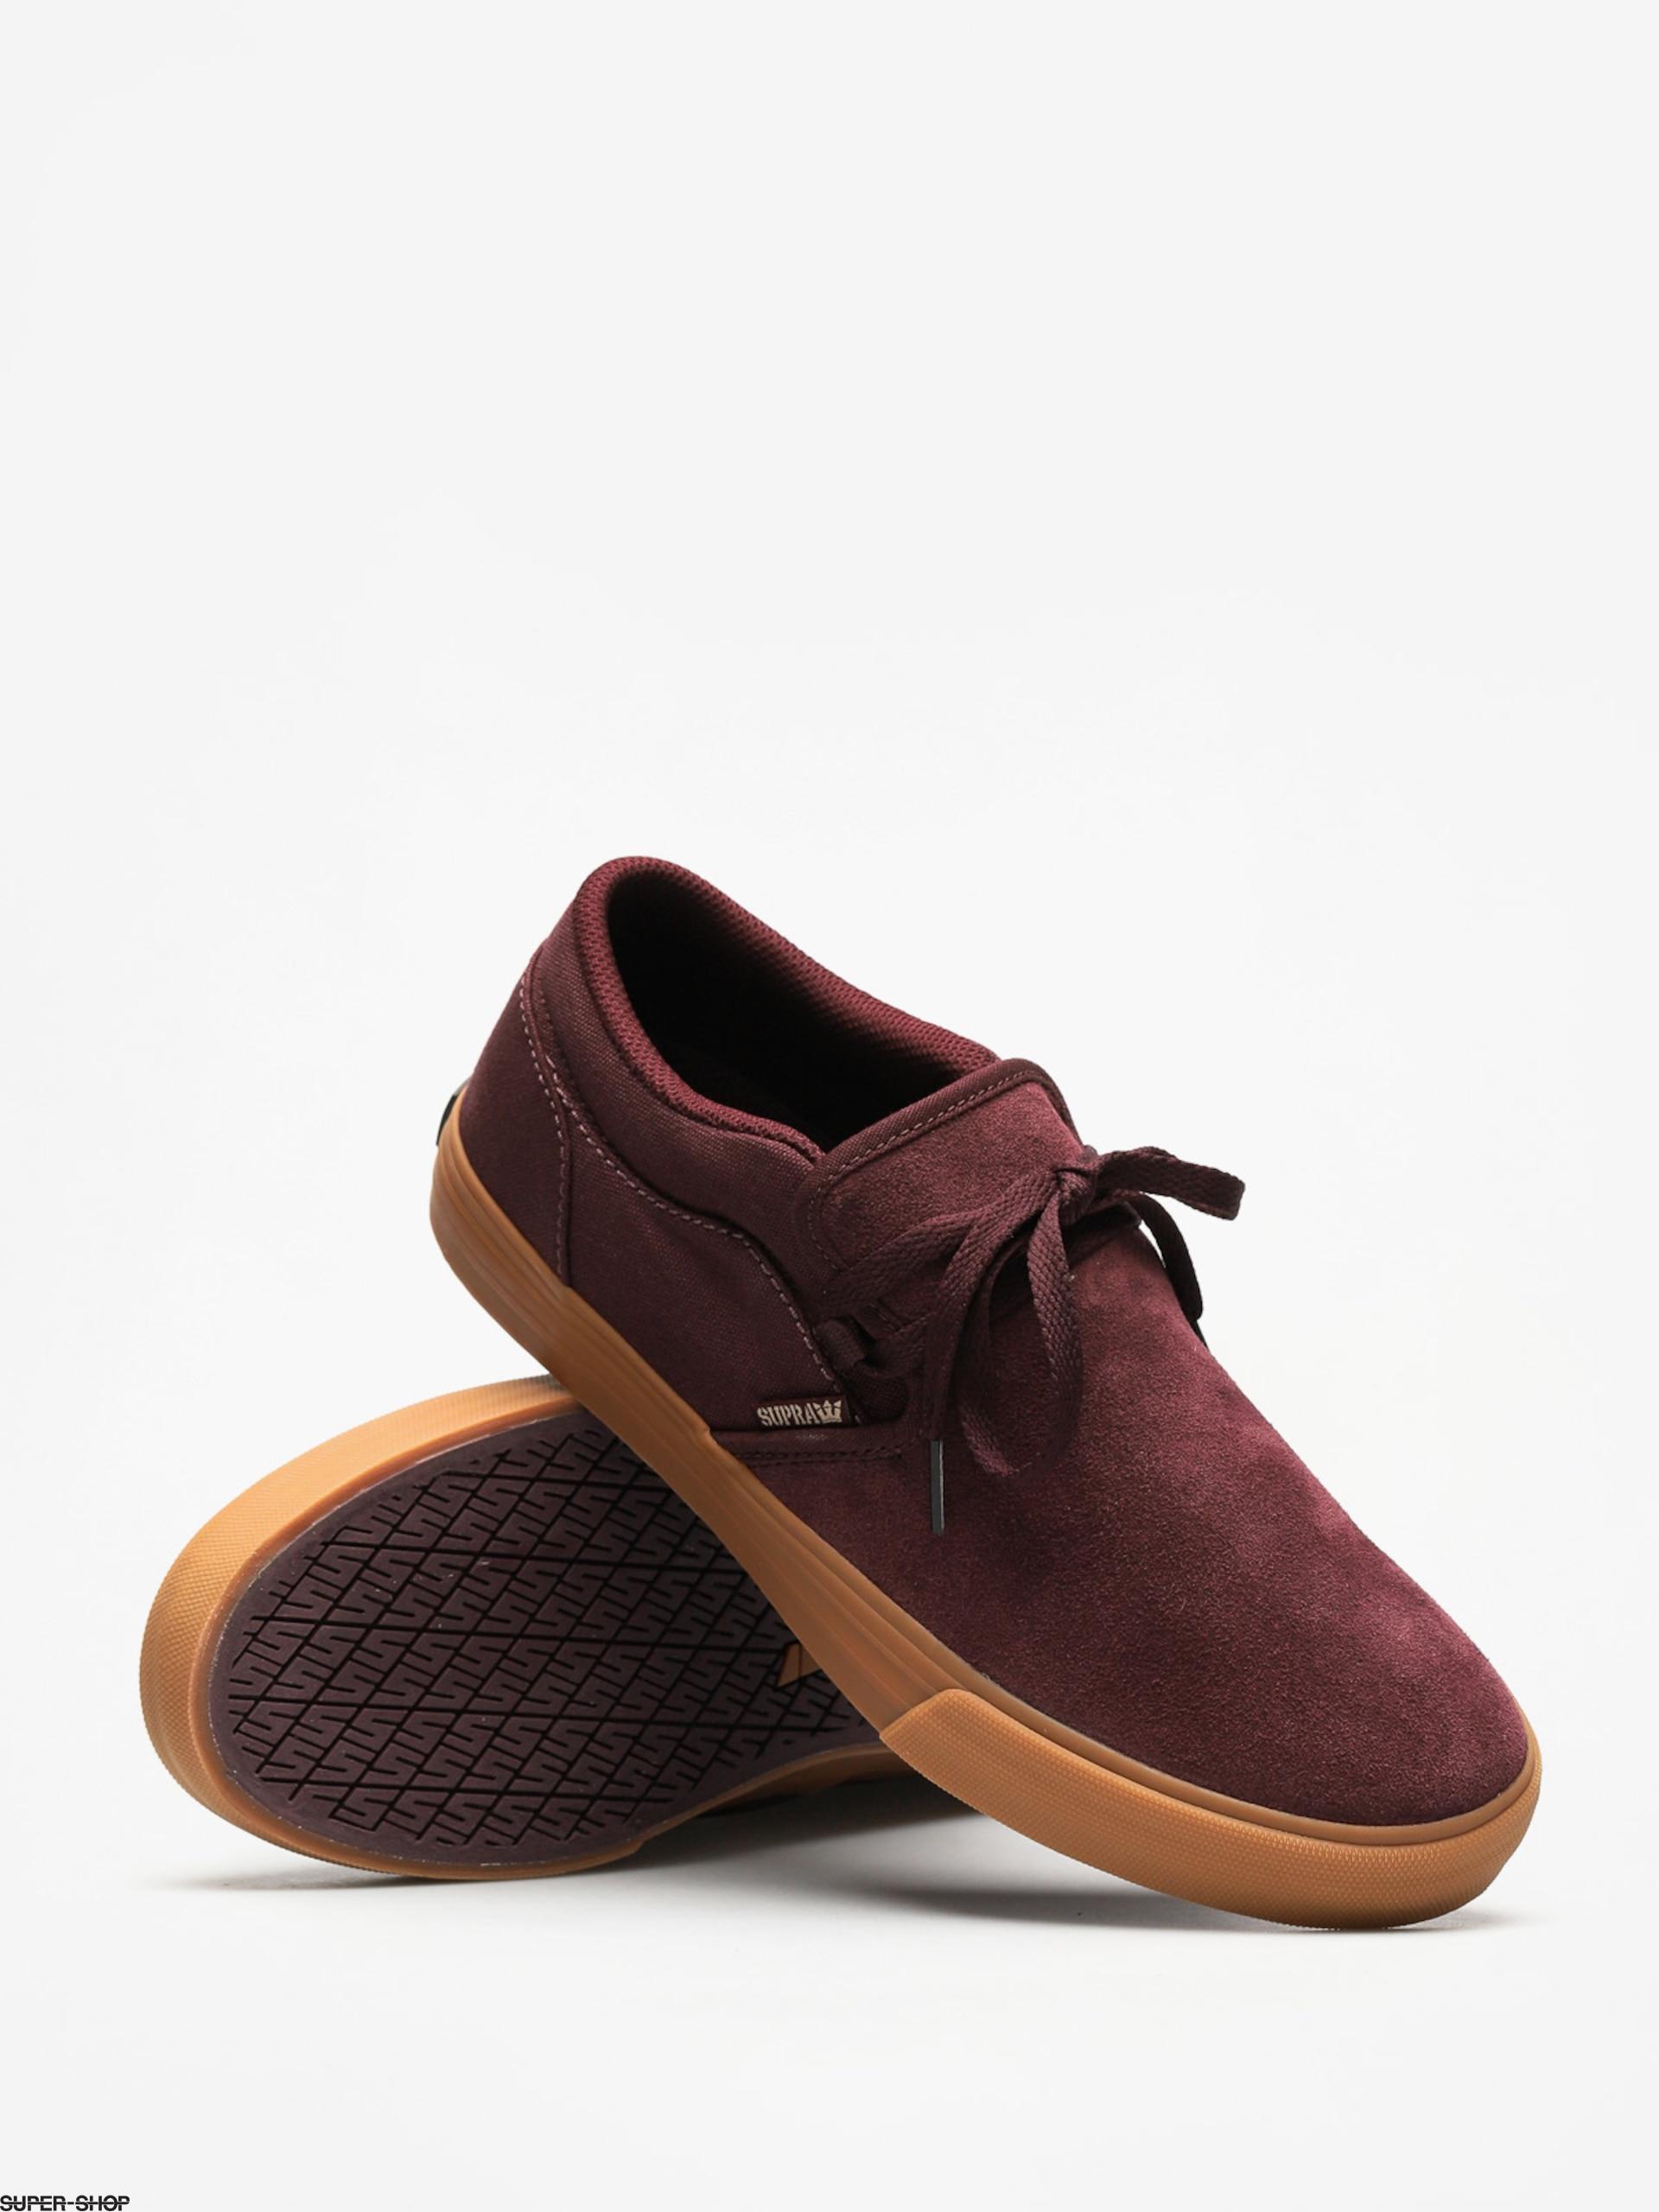 33021e25e8d6 Supra Shoes Cuba (wine gum)